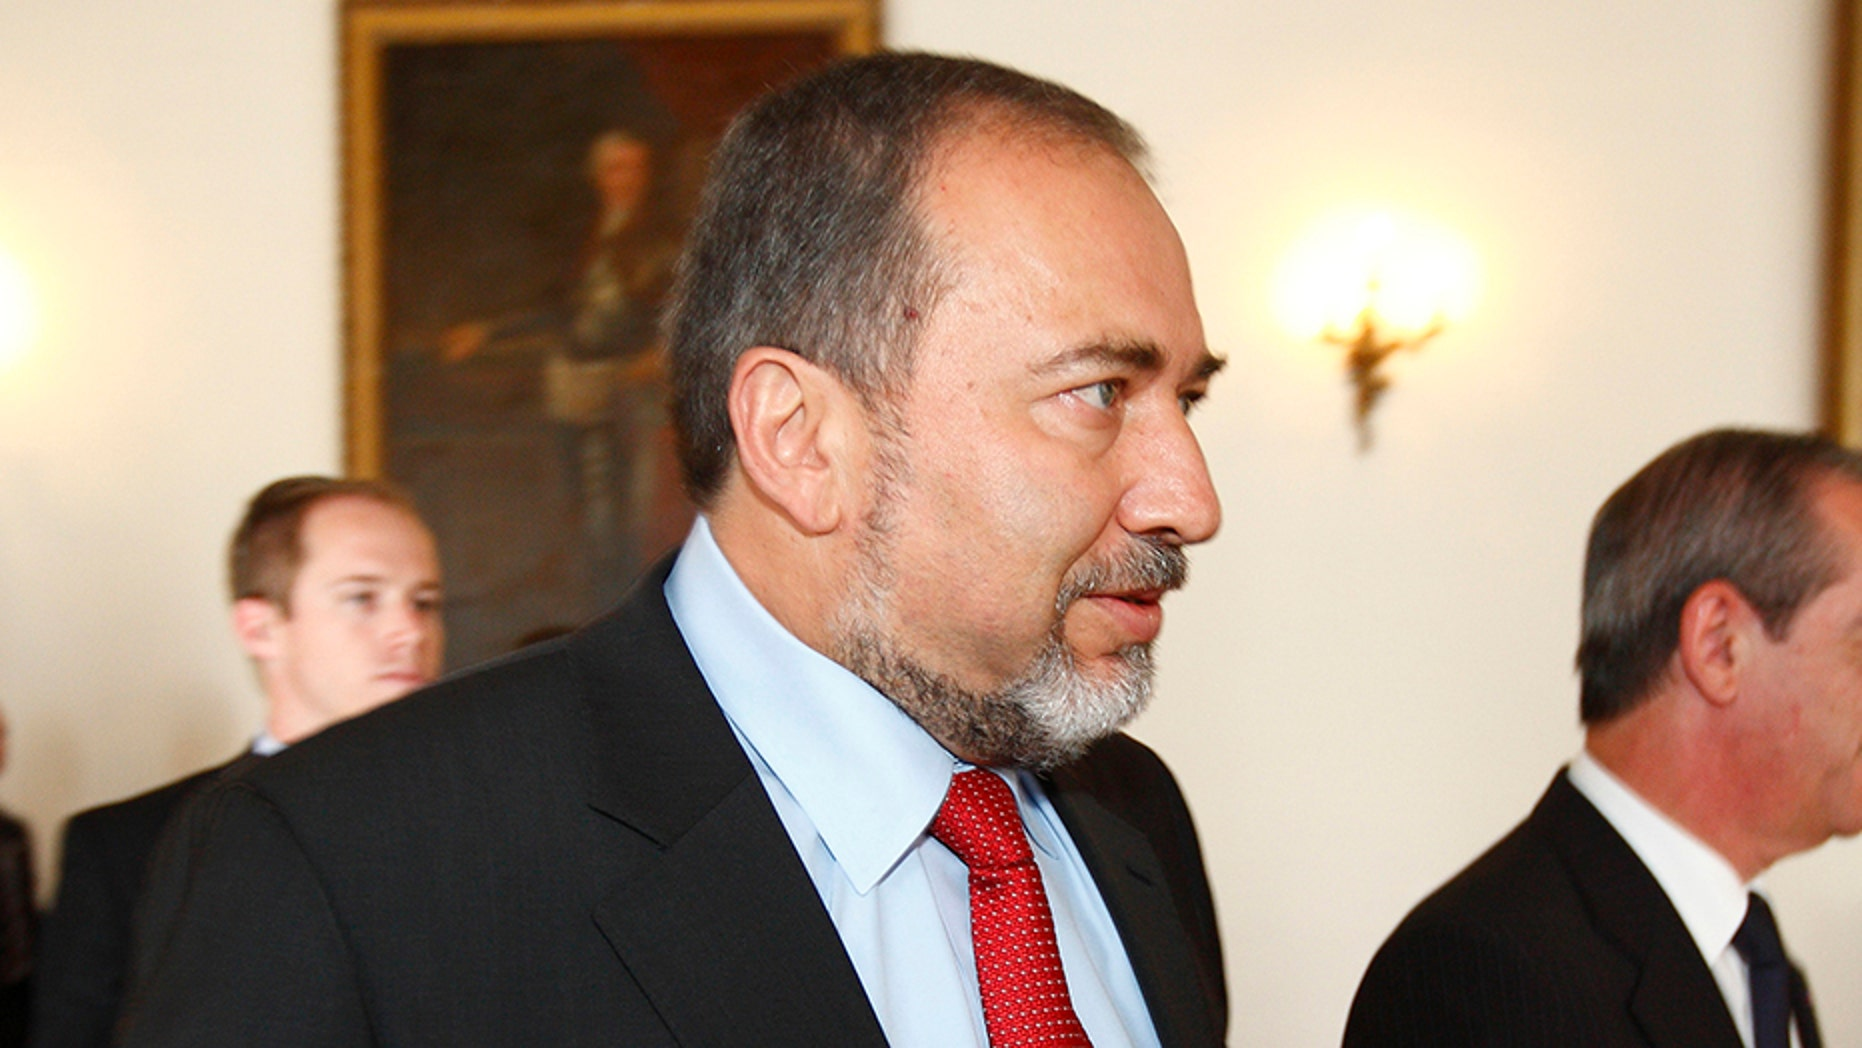 Israel revealed it foiled a terror plot targeting Defense Minister Avigdor Liberman, seen here in 2010.